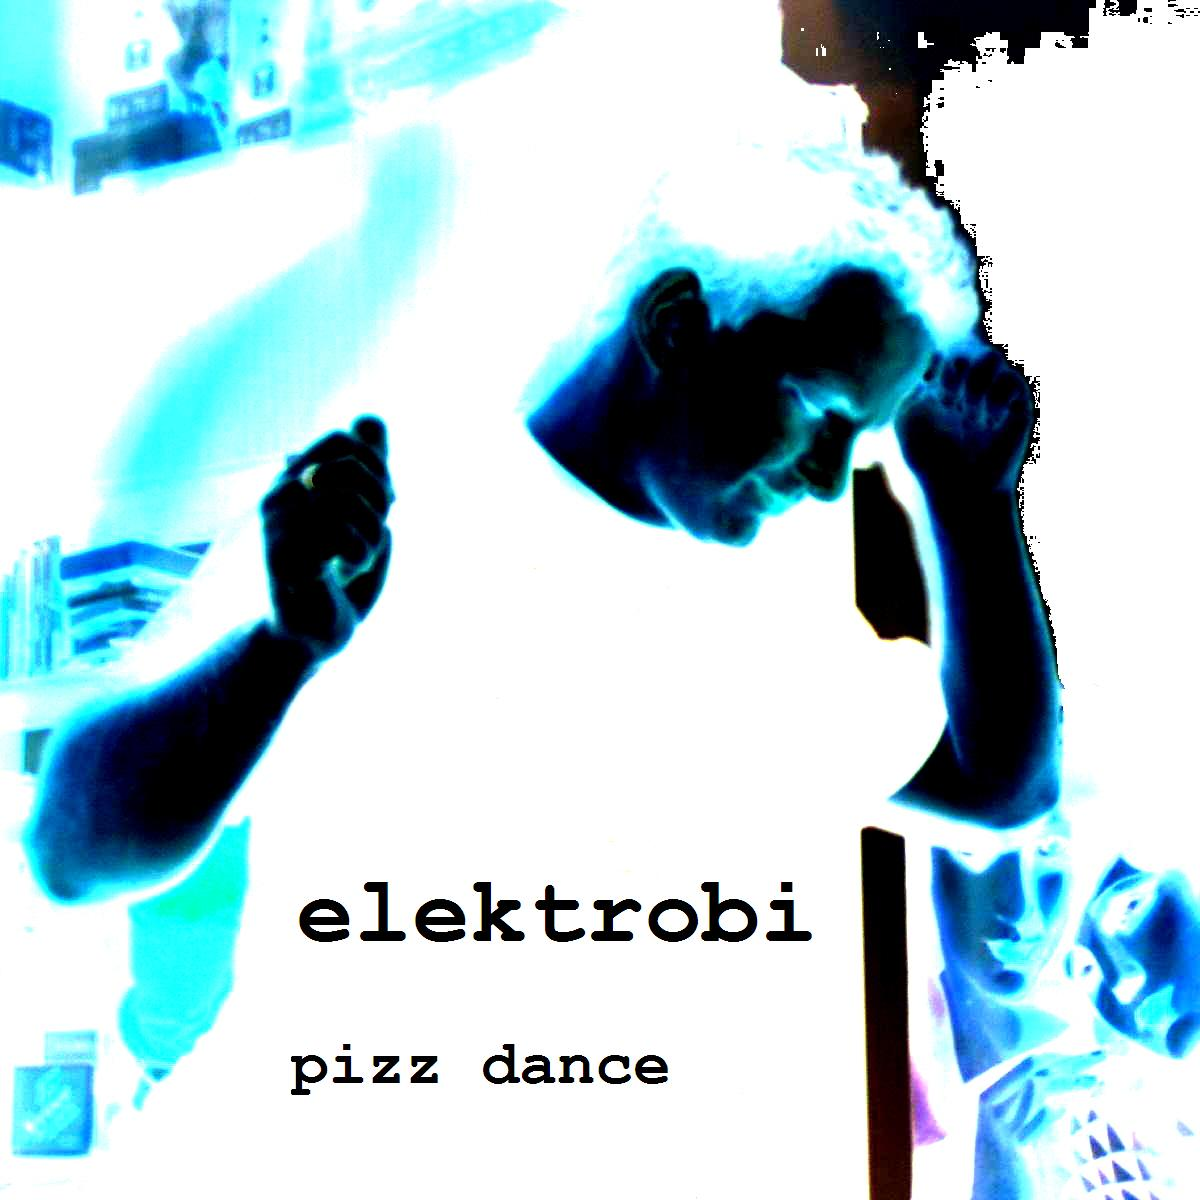 chill12-08 - elektrobi - pizz dance